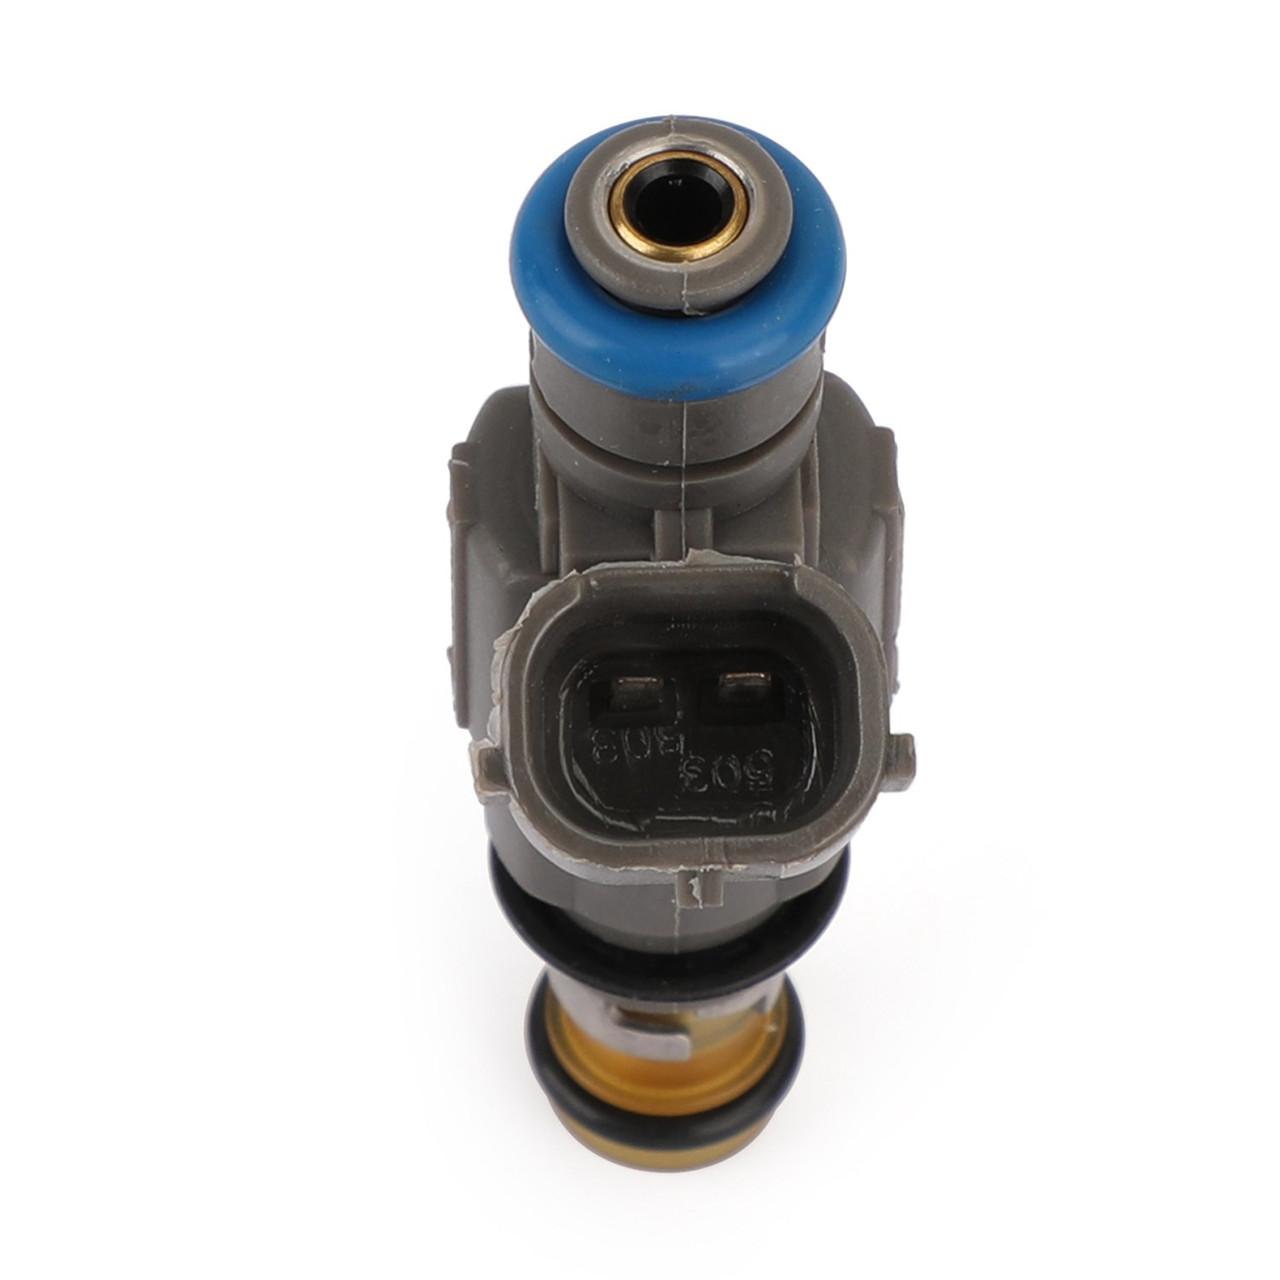 1PCS Fuel Injectors Fit For Subaru Baja 03-06 Legacy Outback 00-04 Brown FBLC-100 16611-AA43A